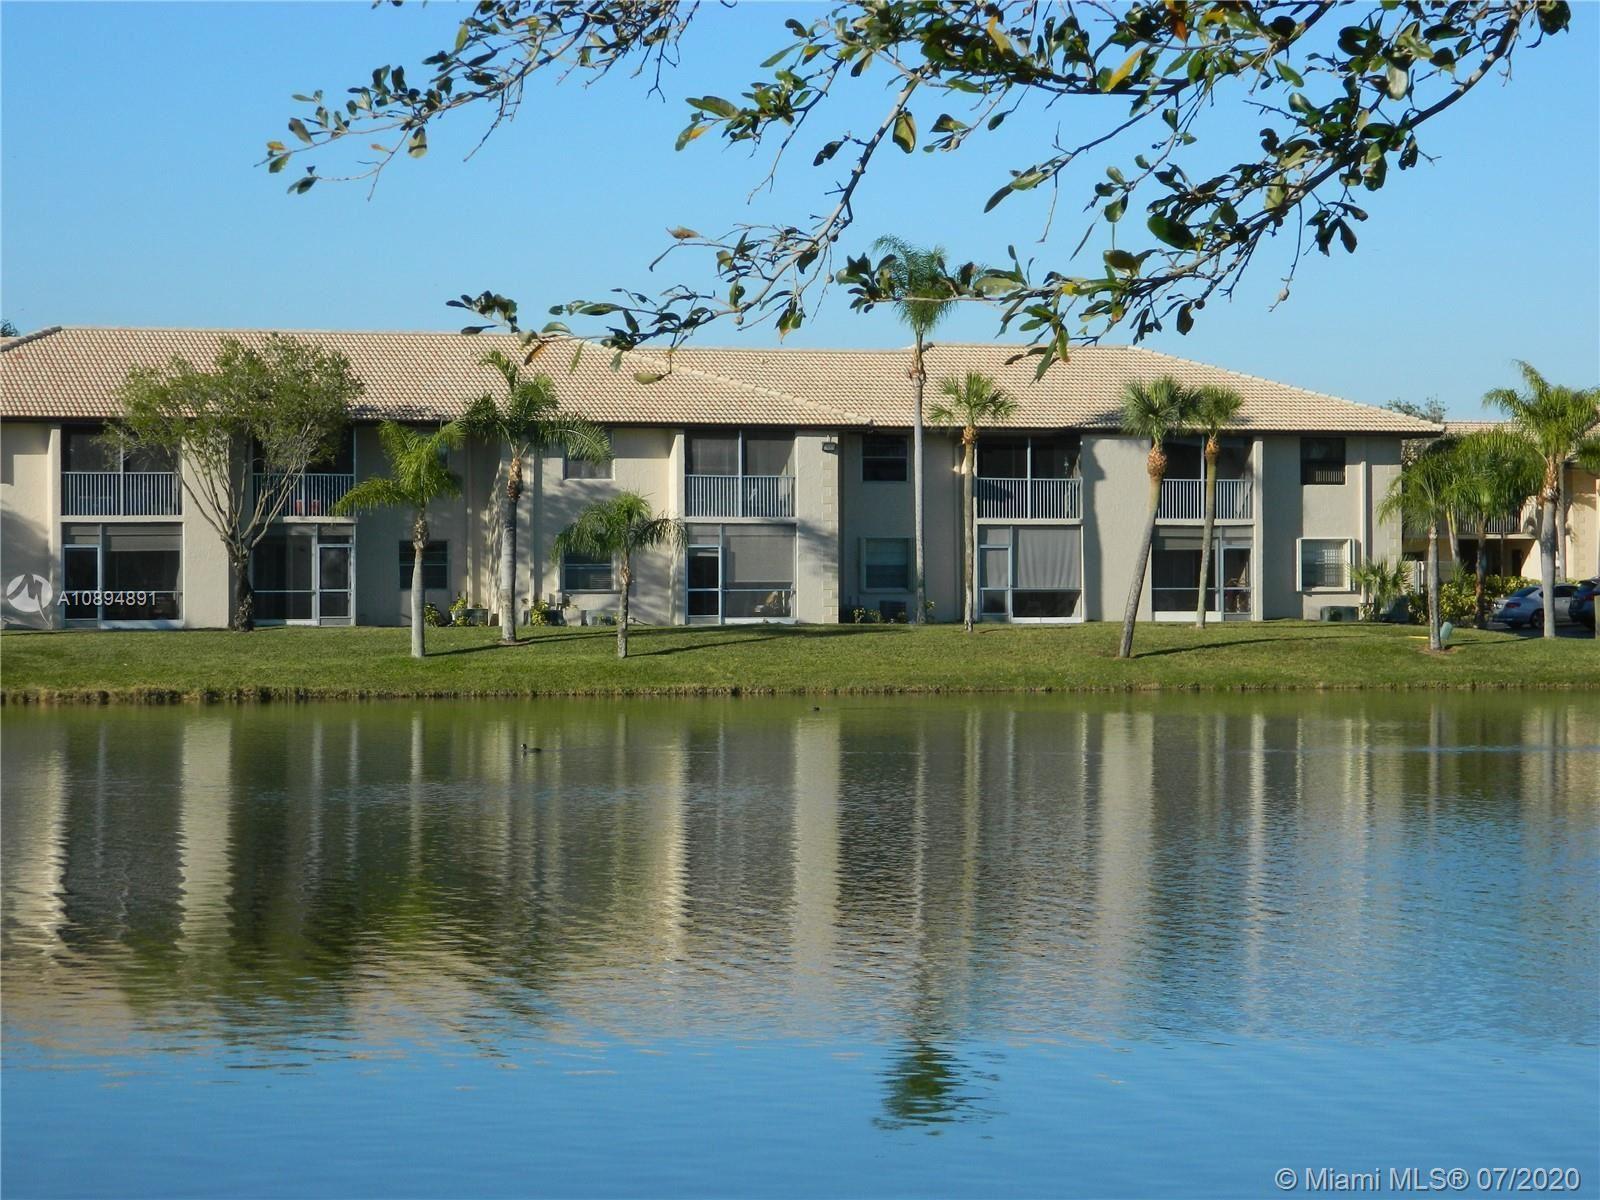 5511 Lakeside Dr #207, Margate, FL 33063 - #: A10894891